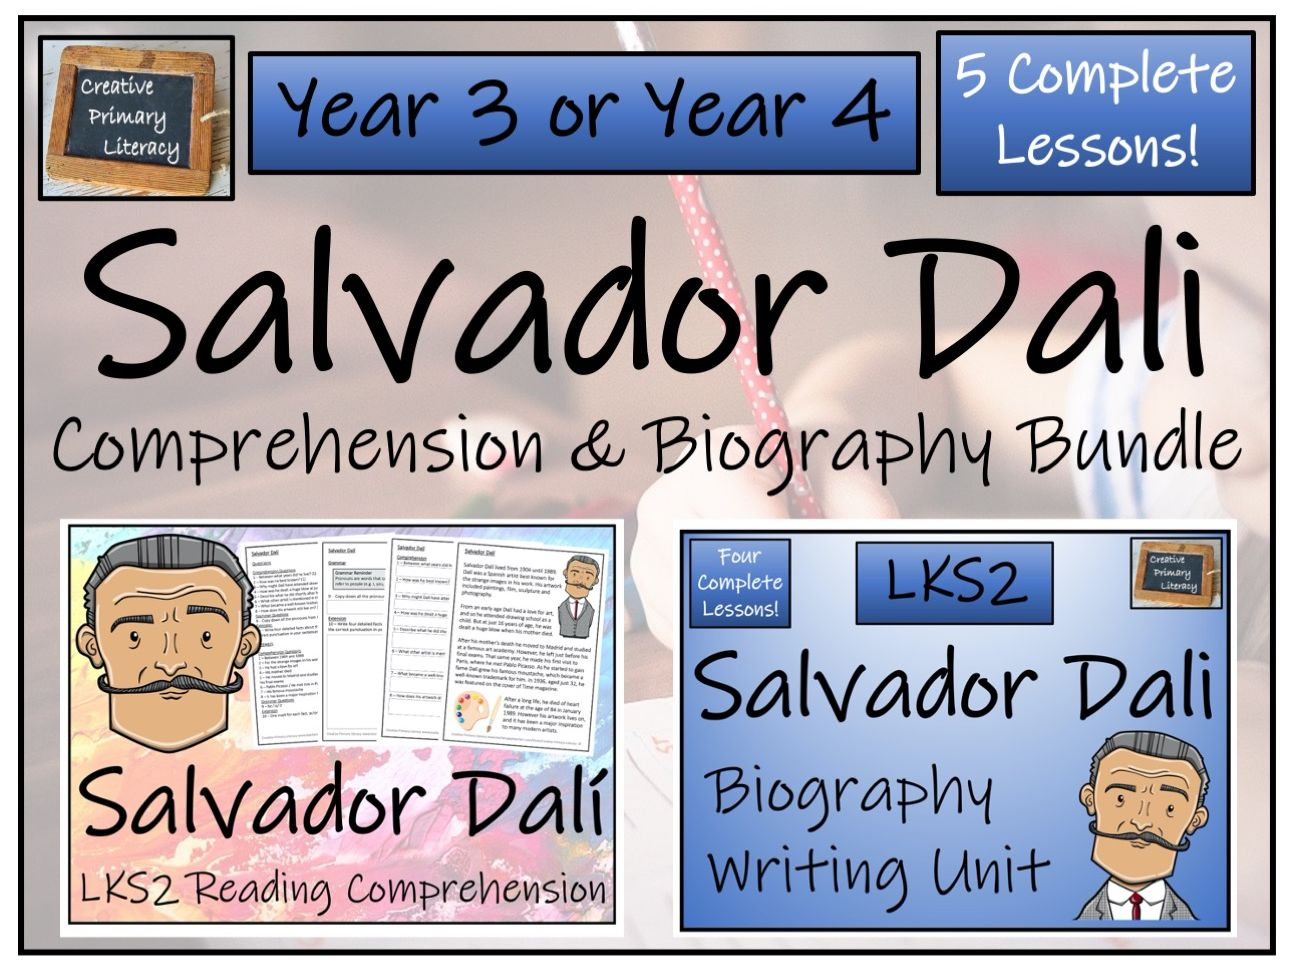 LKS2 Salvador Dali Reading Comprehension & Biography Bundle